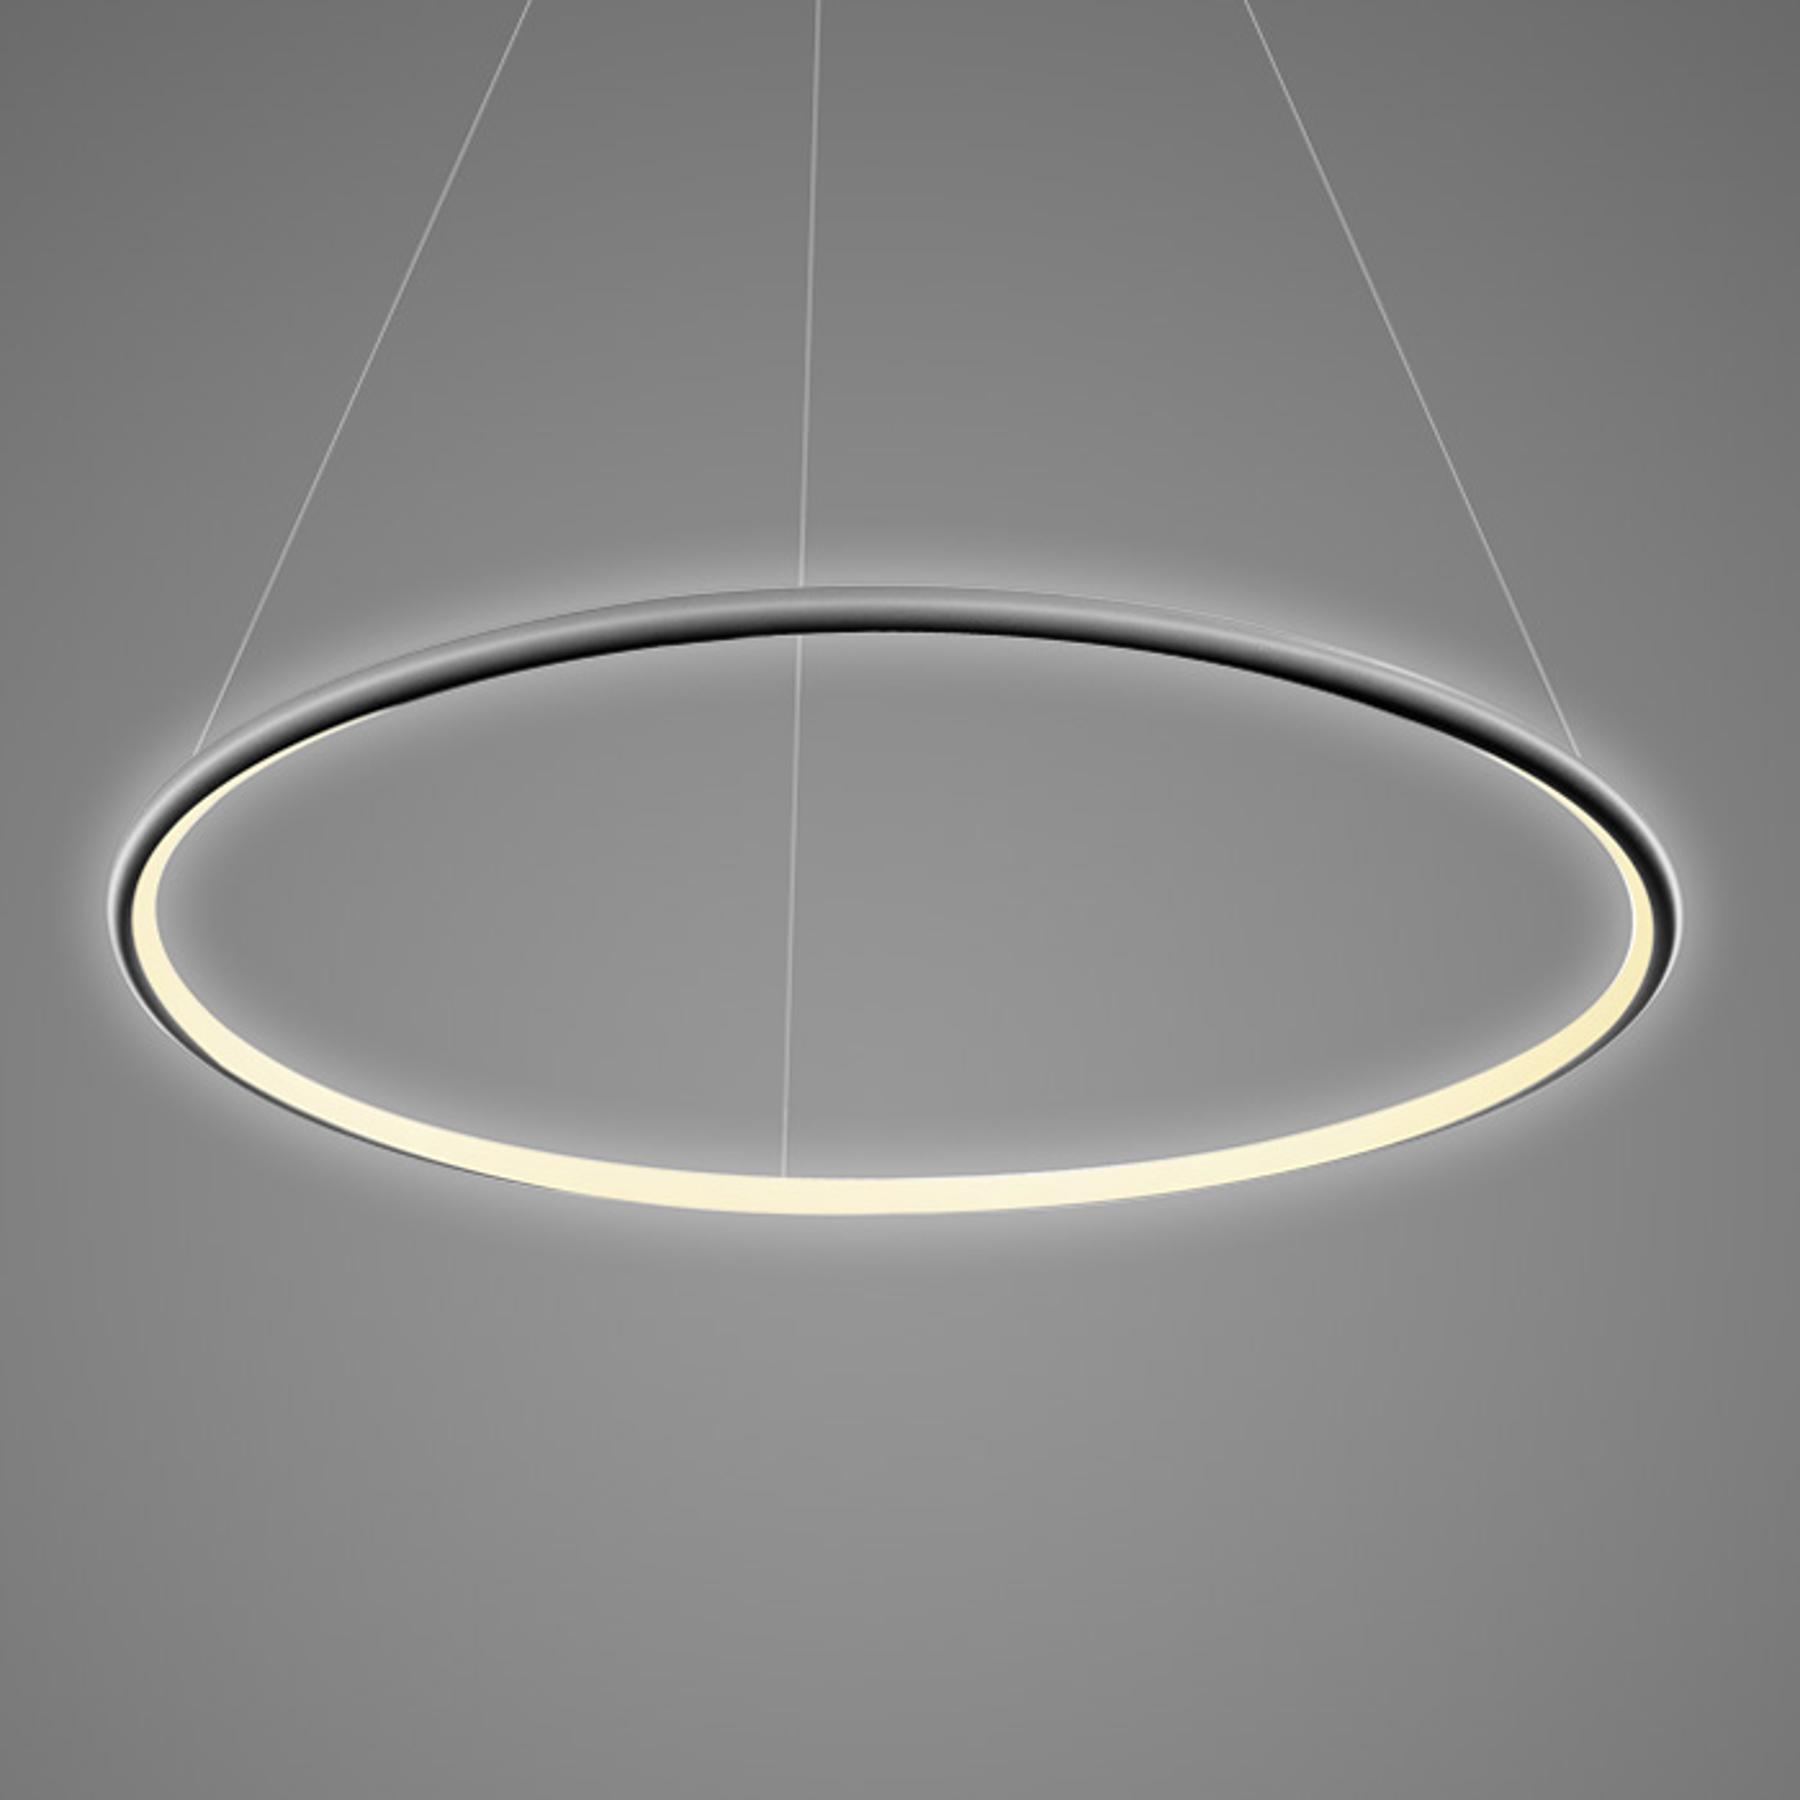 Lampa wisząca LA073 1-pkt. Ø 80cm czarna 3000K